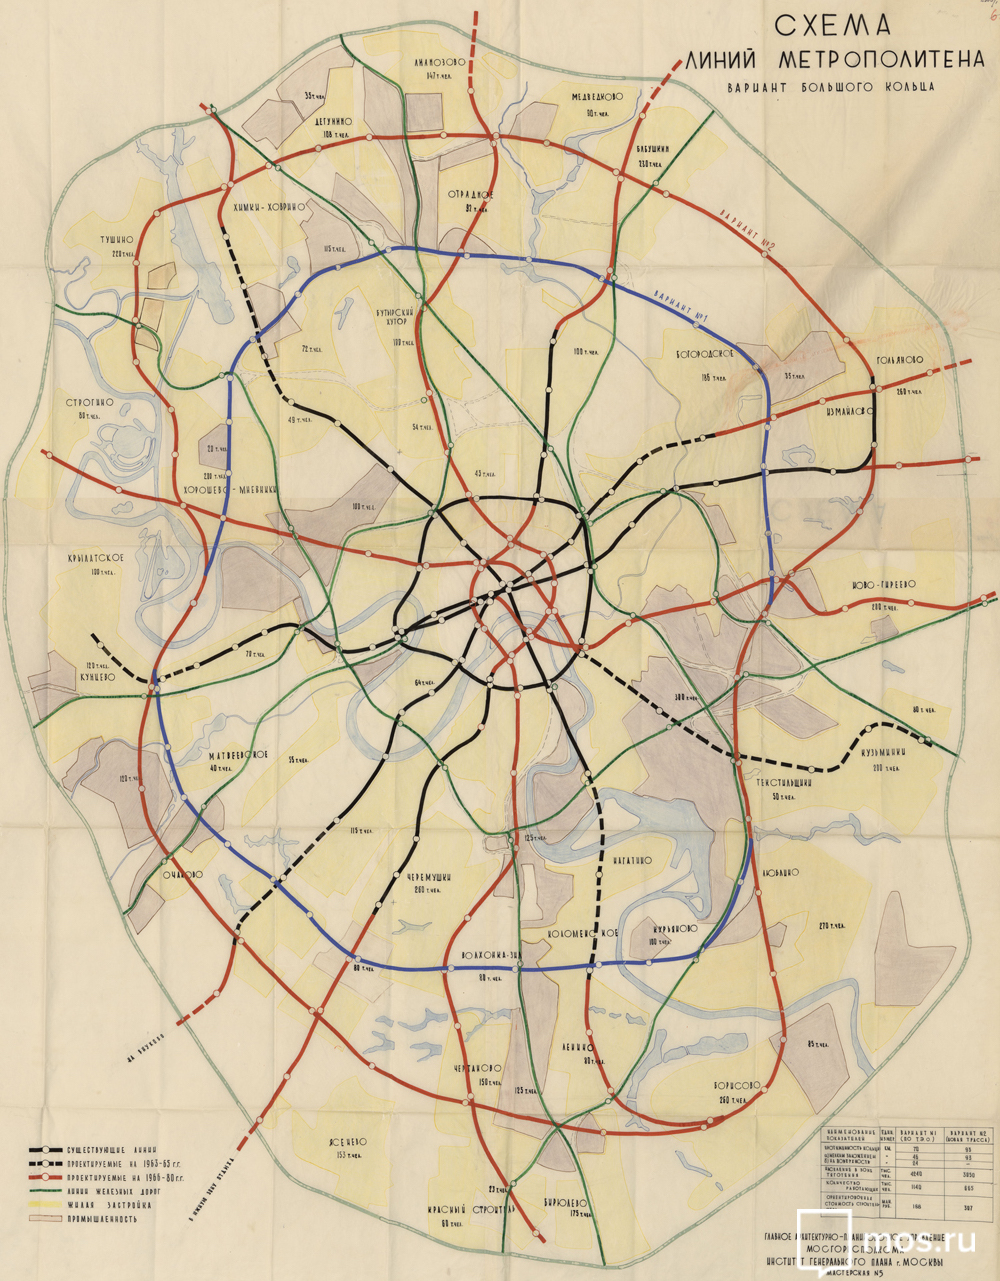 Moscow metro 1963 (perspective scheme) © Mos.ru, 2018